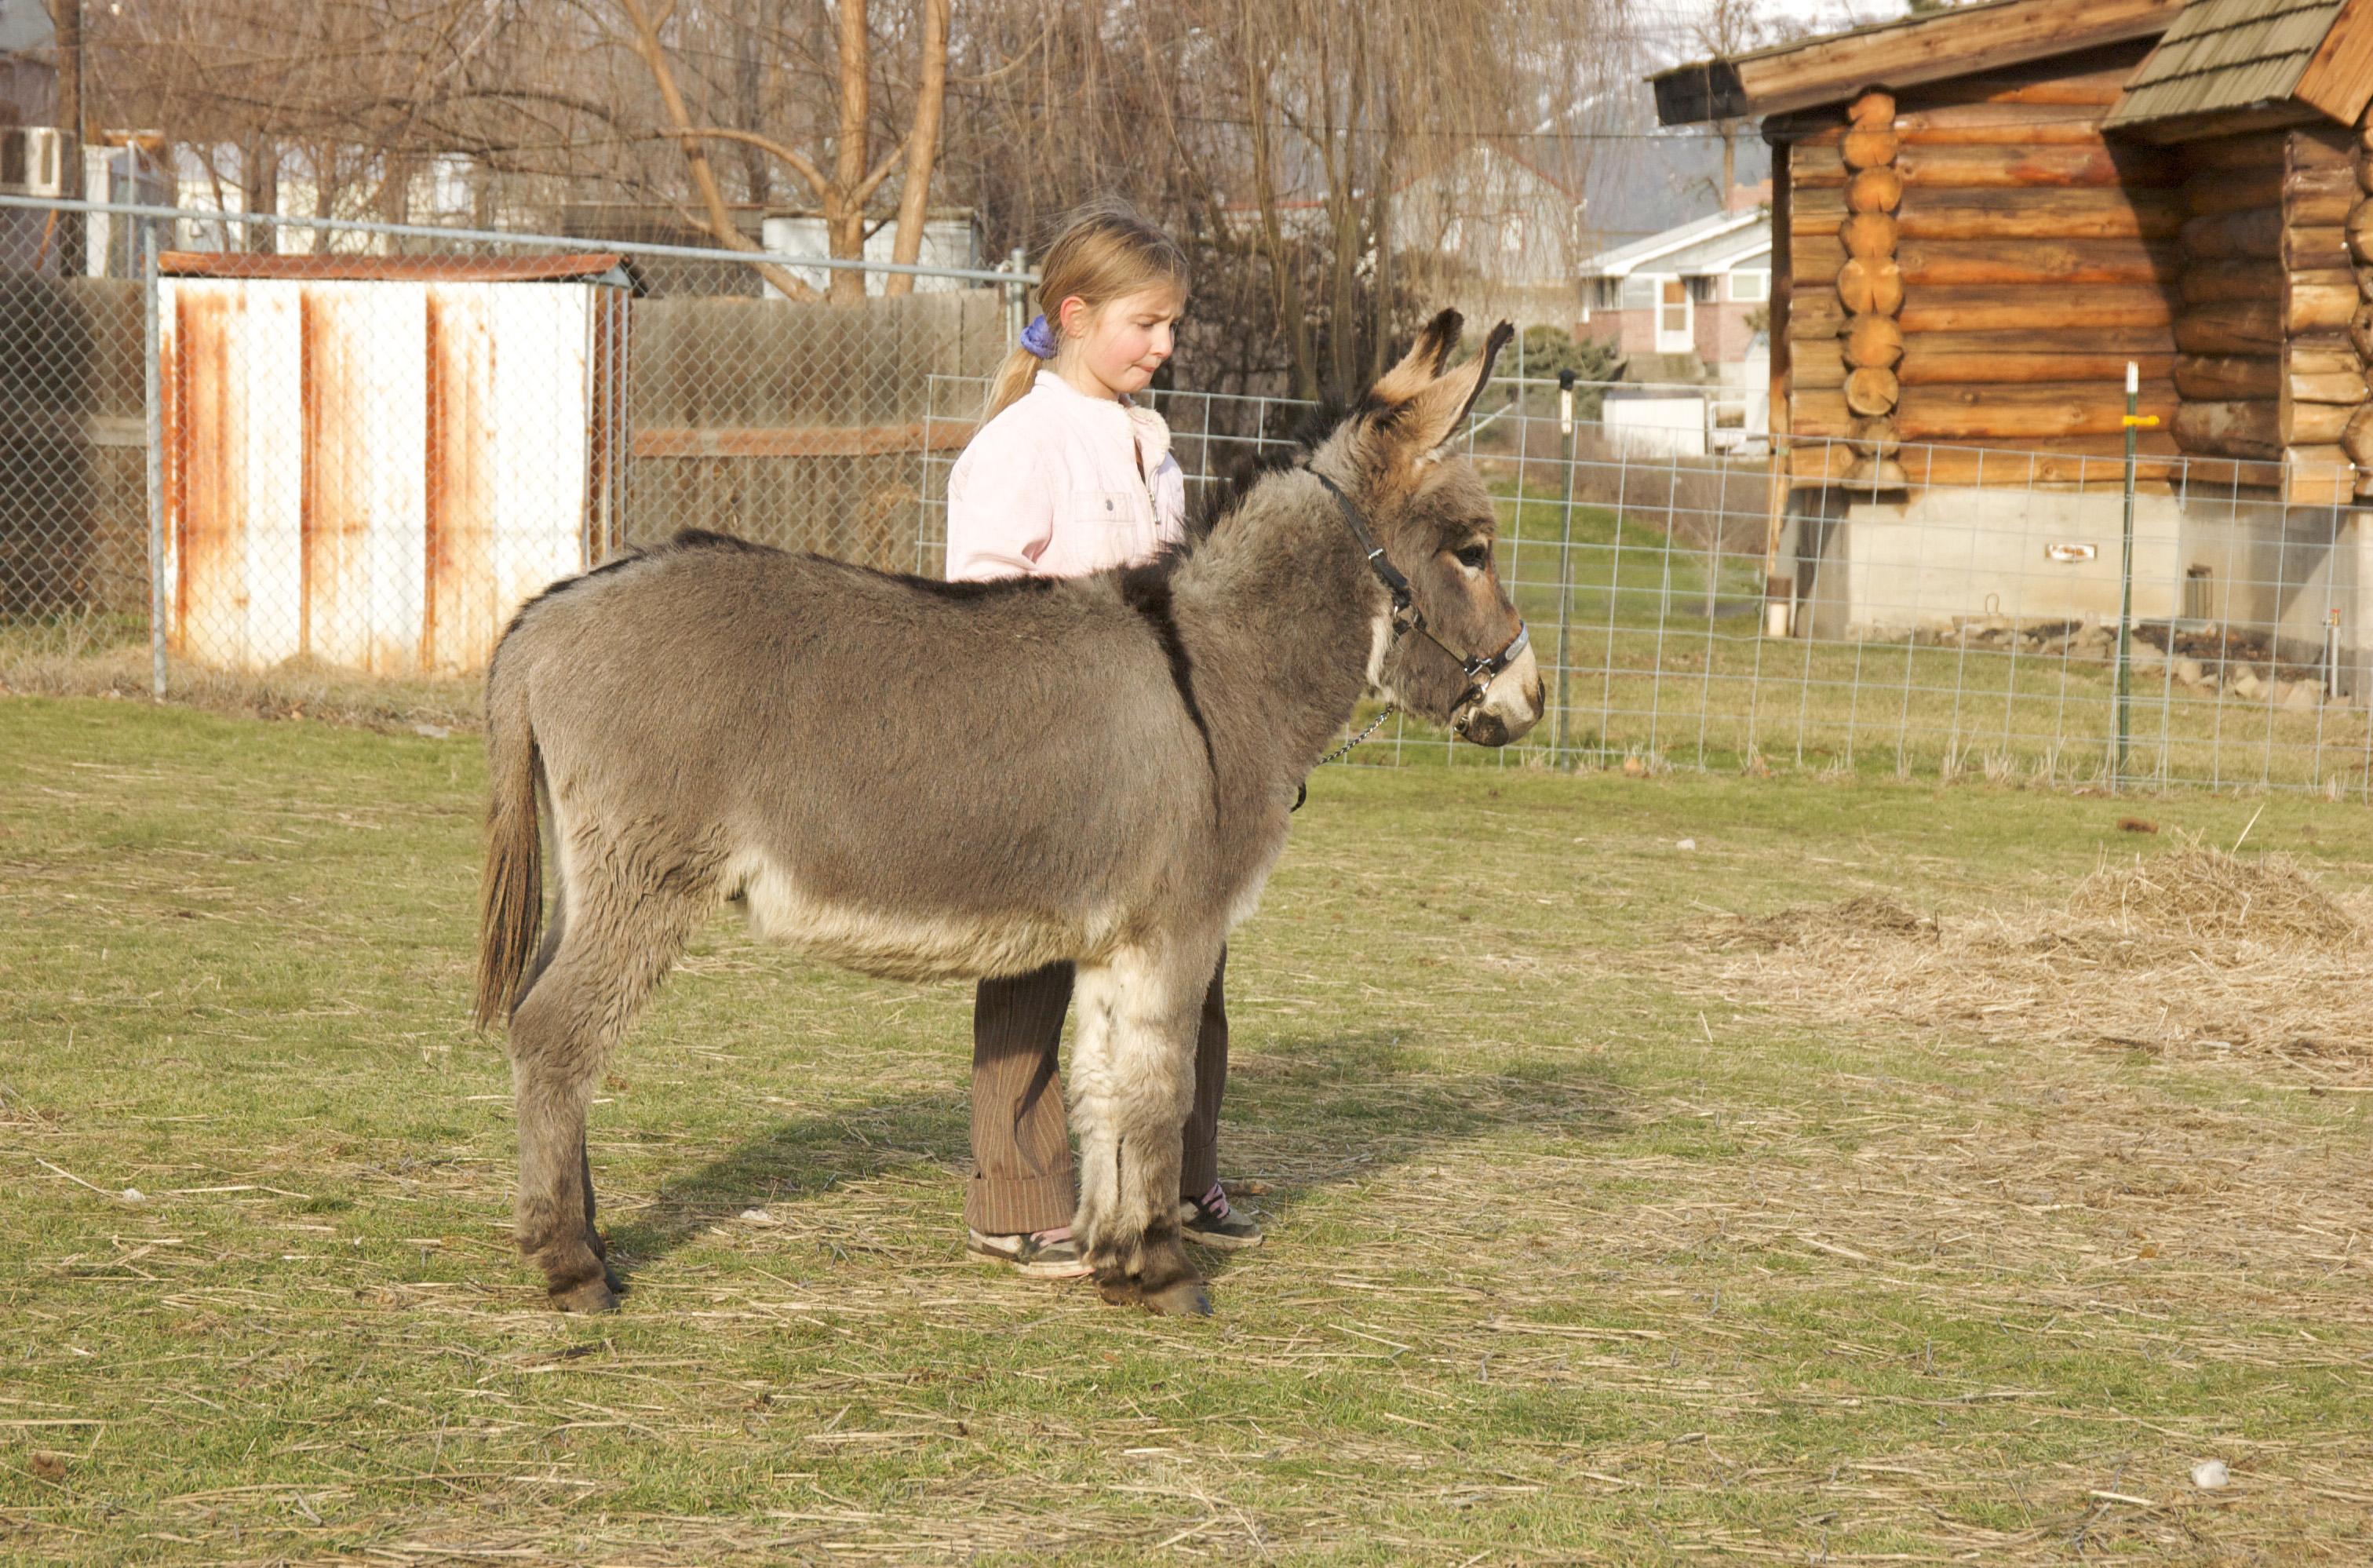 honkey donkey coloring pages - photo#35